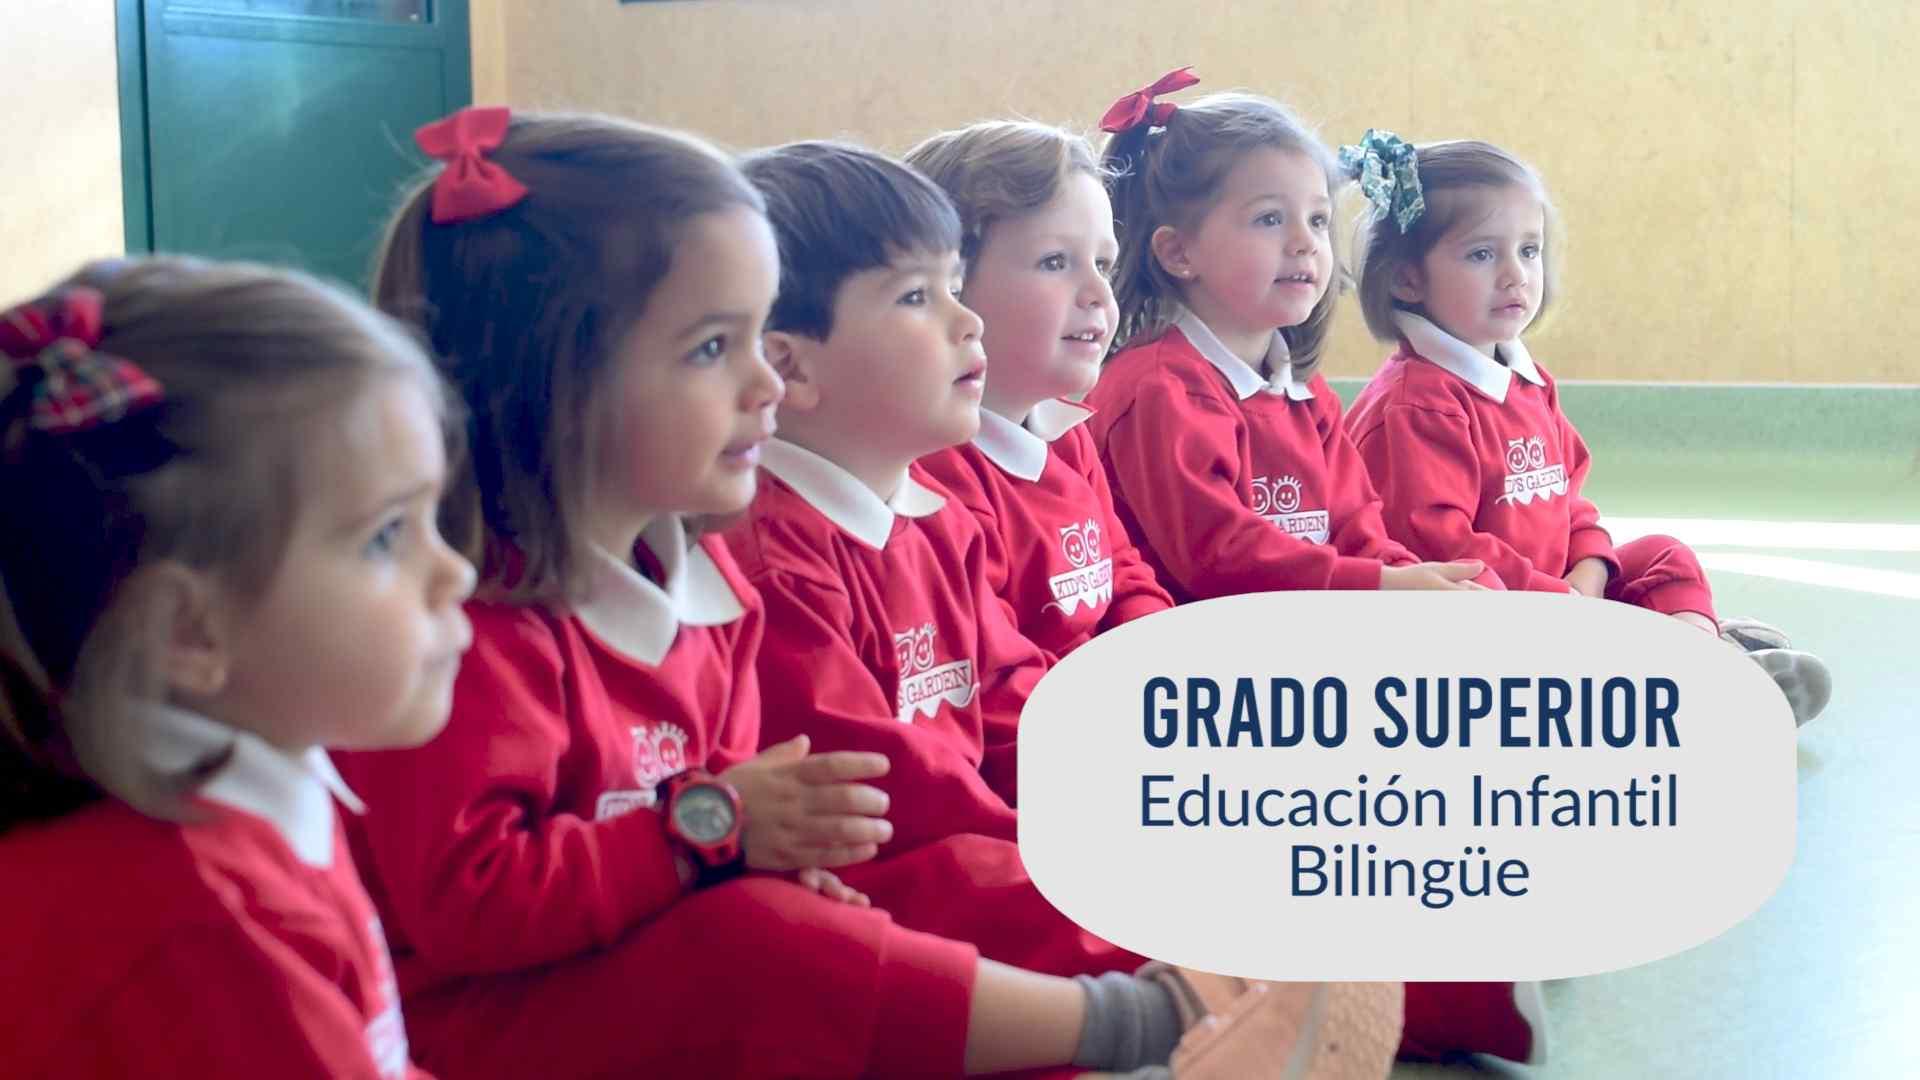 fp dual educación infantil